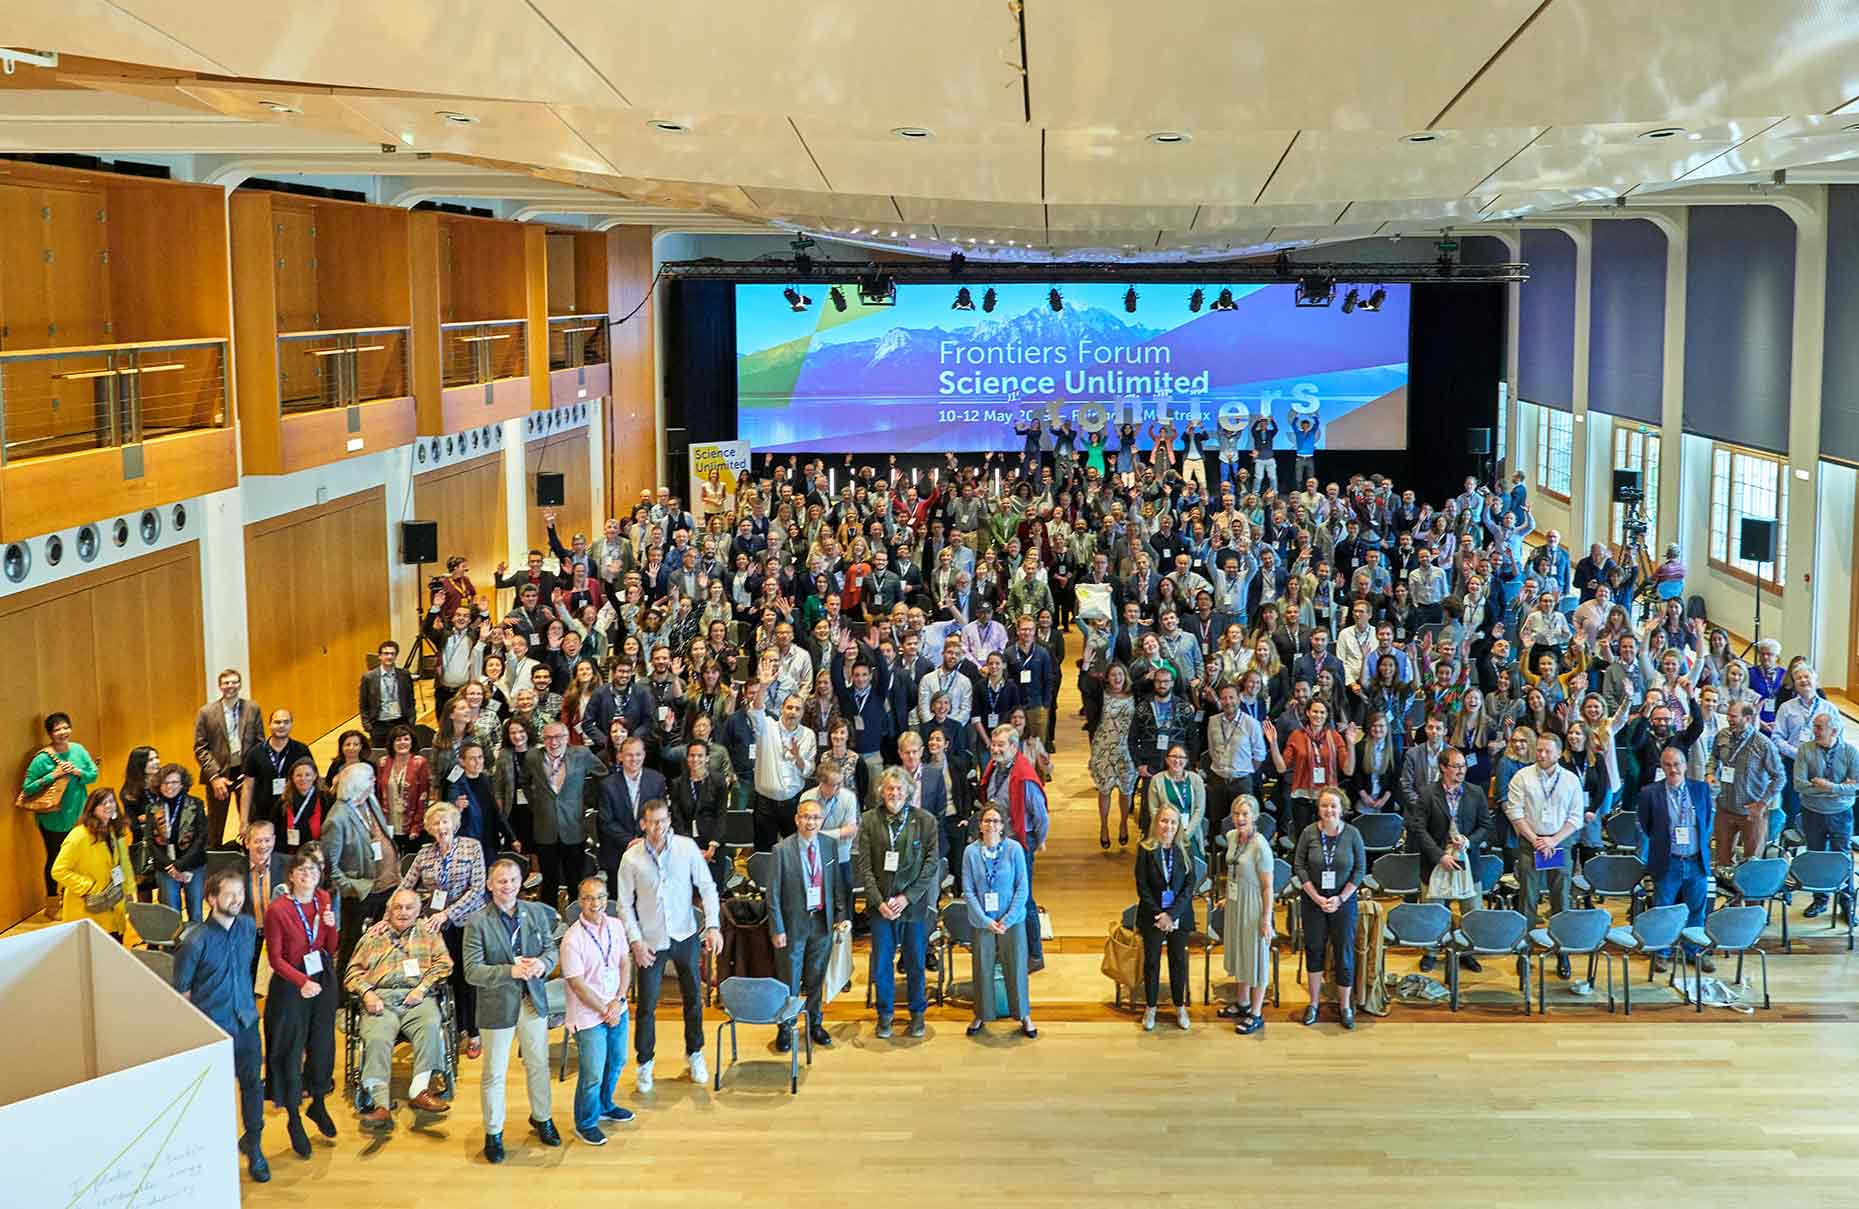 frontiers-forum-science-unlimited-2019-9.jpg